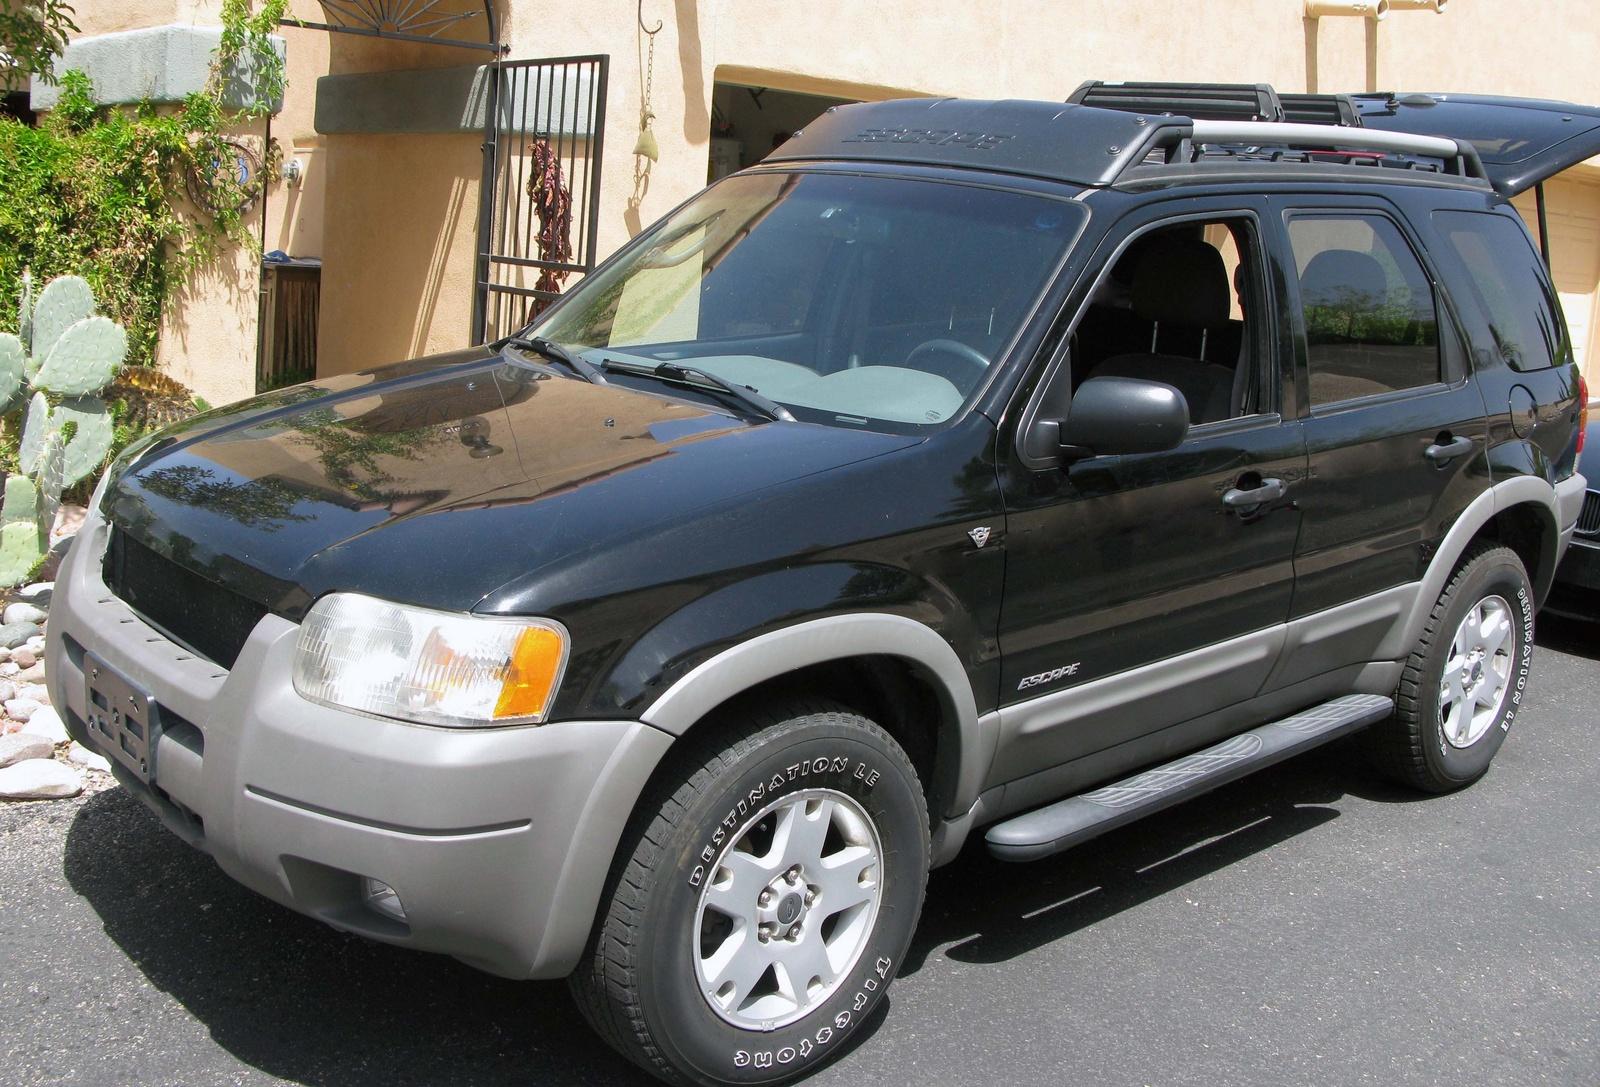 escape 2002 ford cargurus xlt 4wd